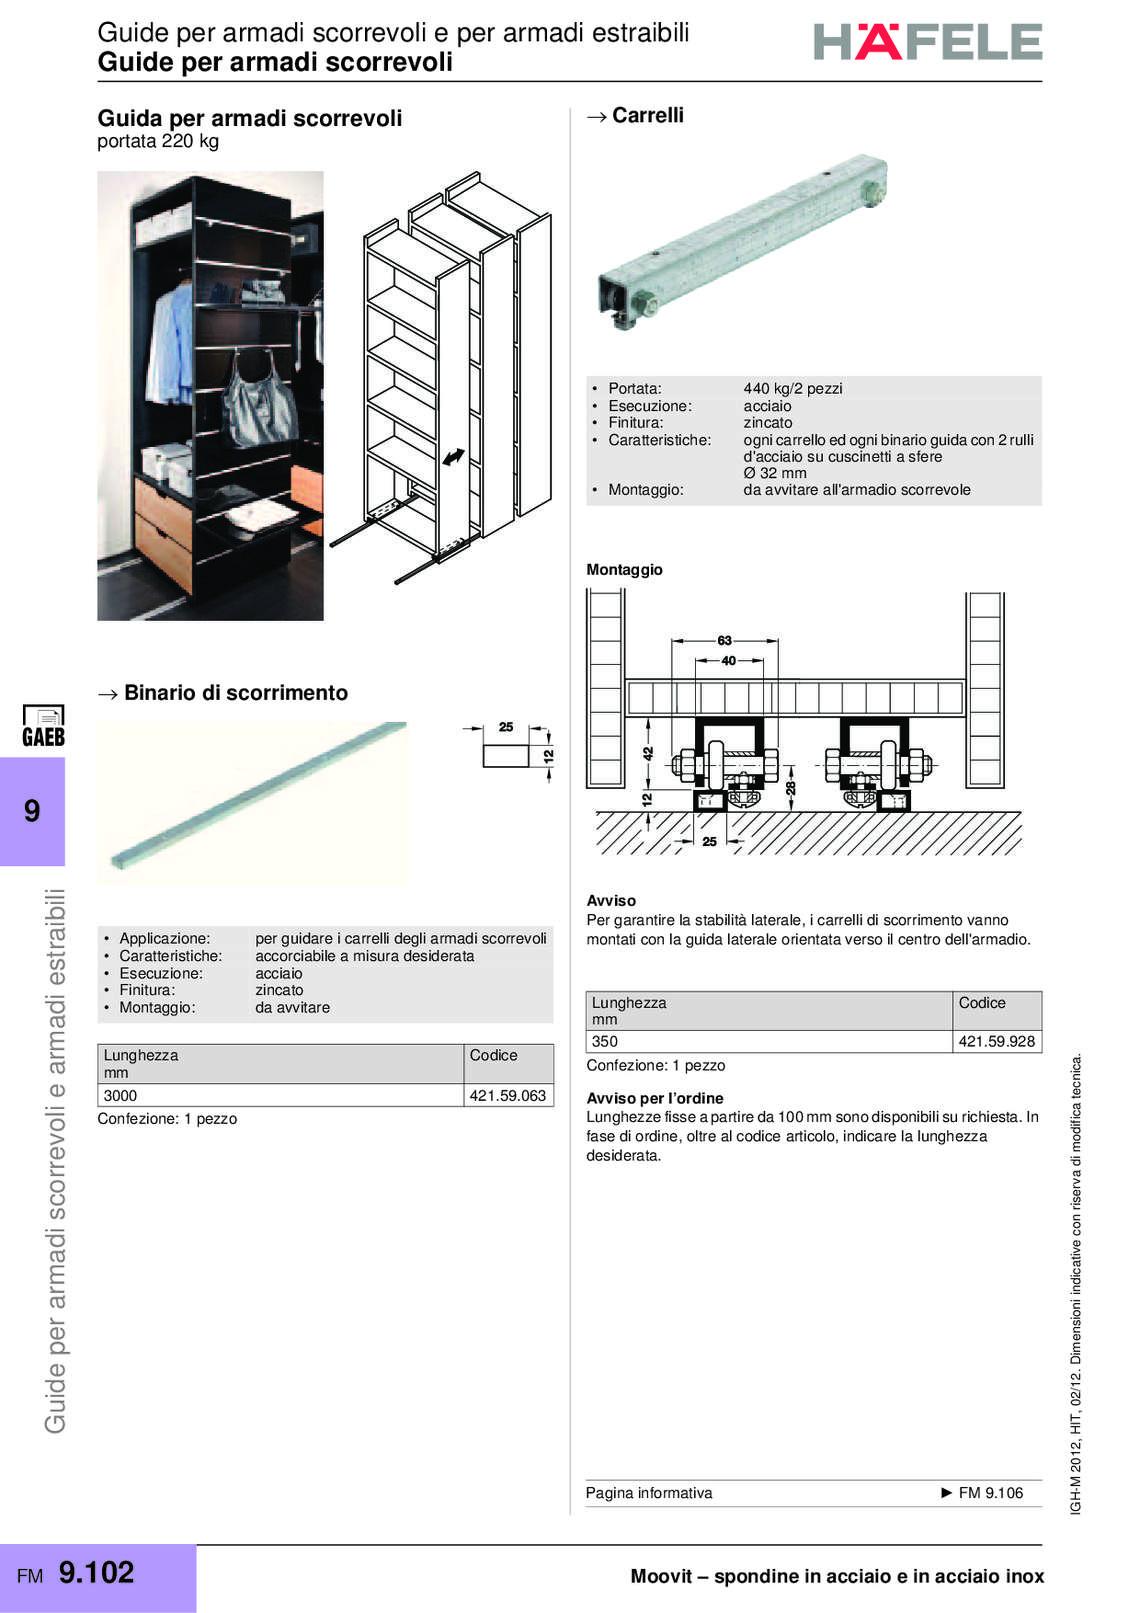 hafele-spondine-e-guide-per-mobili_40_149.jpg